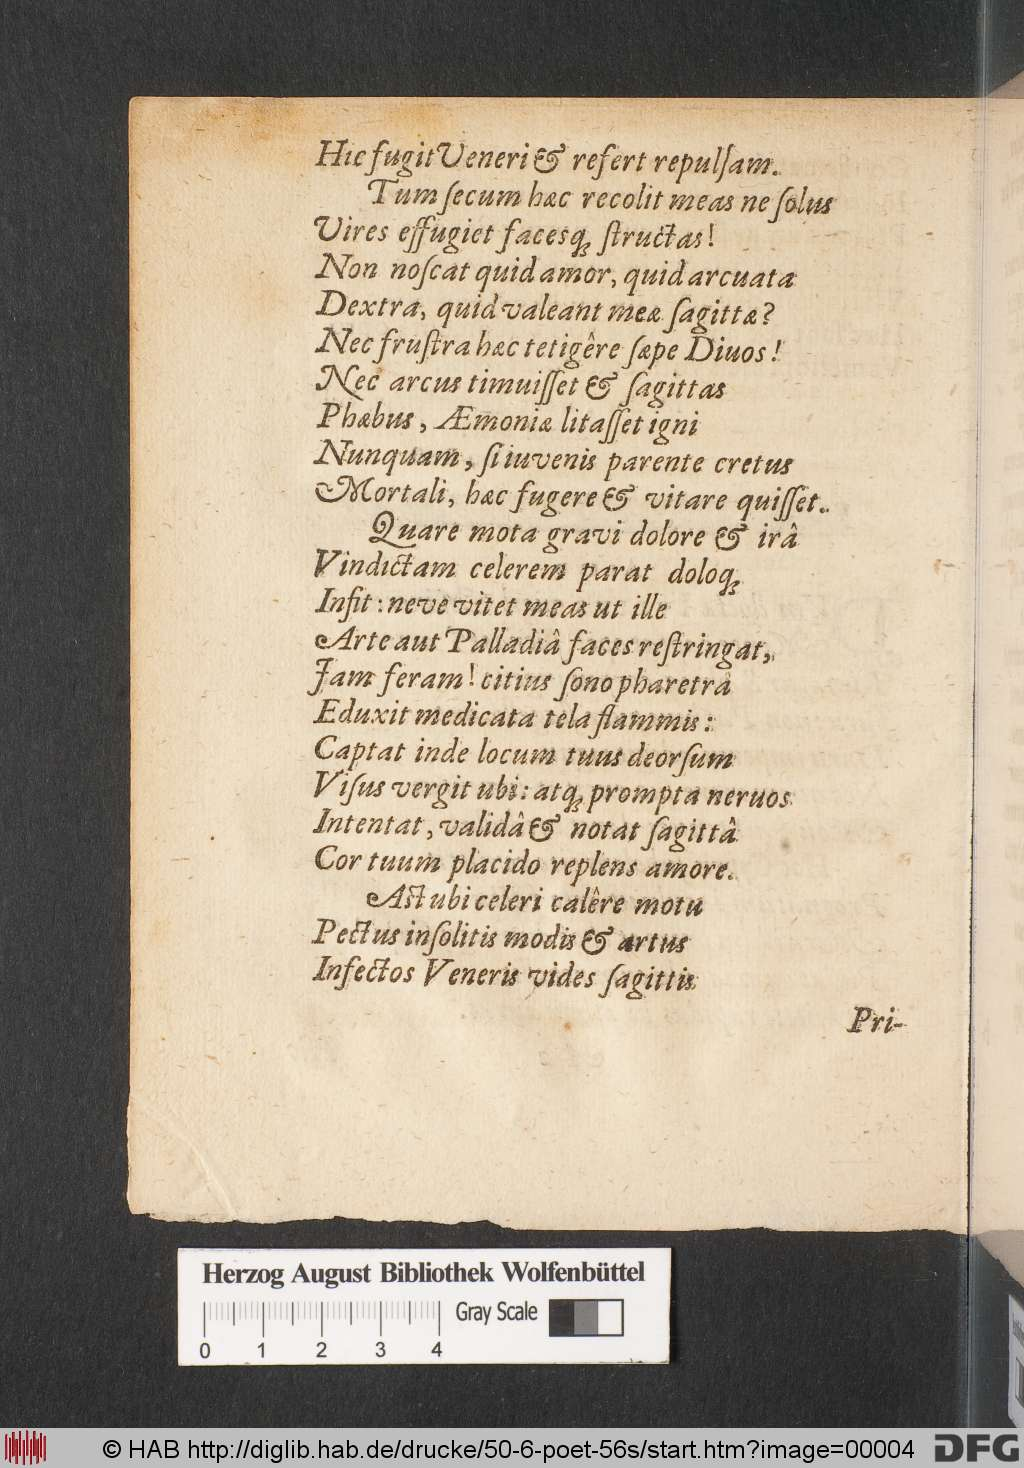 https://diglib.hab.de/drucke/50-6-poet-56s/00004.jpg